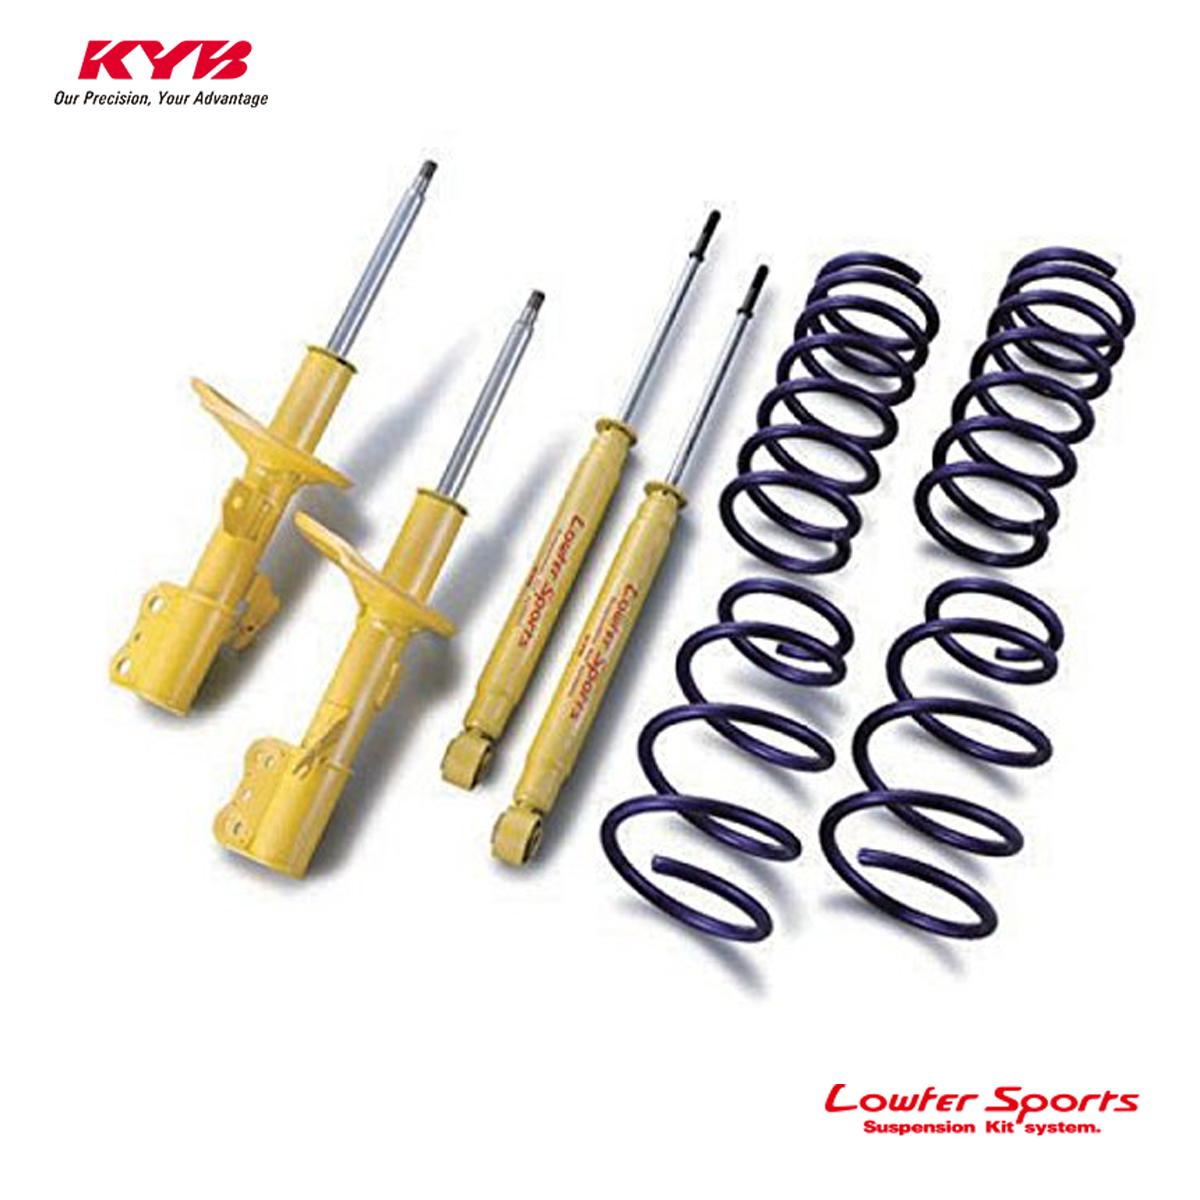 KYB カヤバ CX-5 KE2FW ショックアブソーバー サスペンションキット Lowfer Sports LKIT-KE2FW9 配送先条件有り